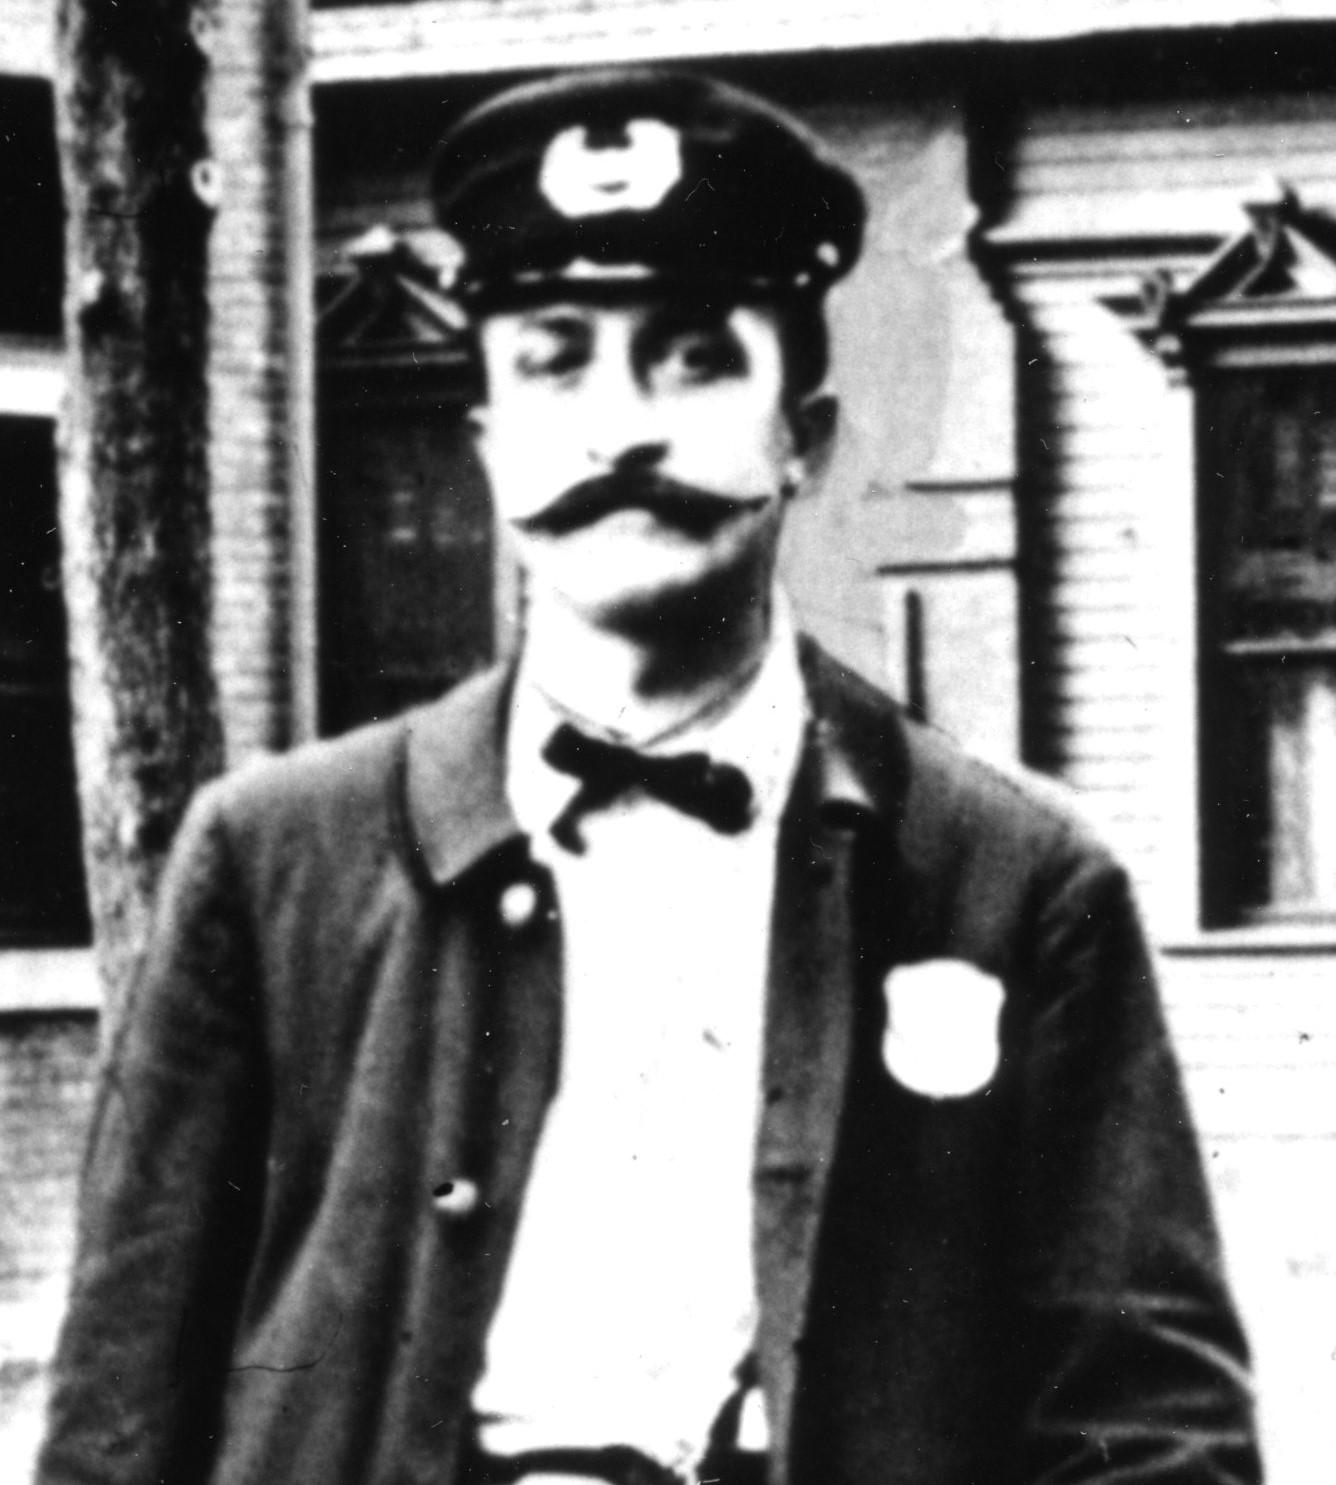 Police Officer Charles J. Stewart | Detroit Police Department, Michigan